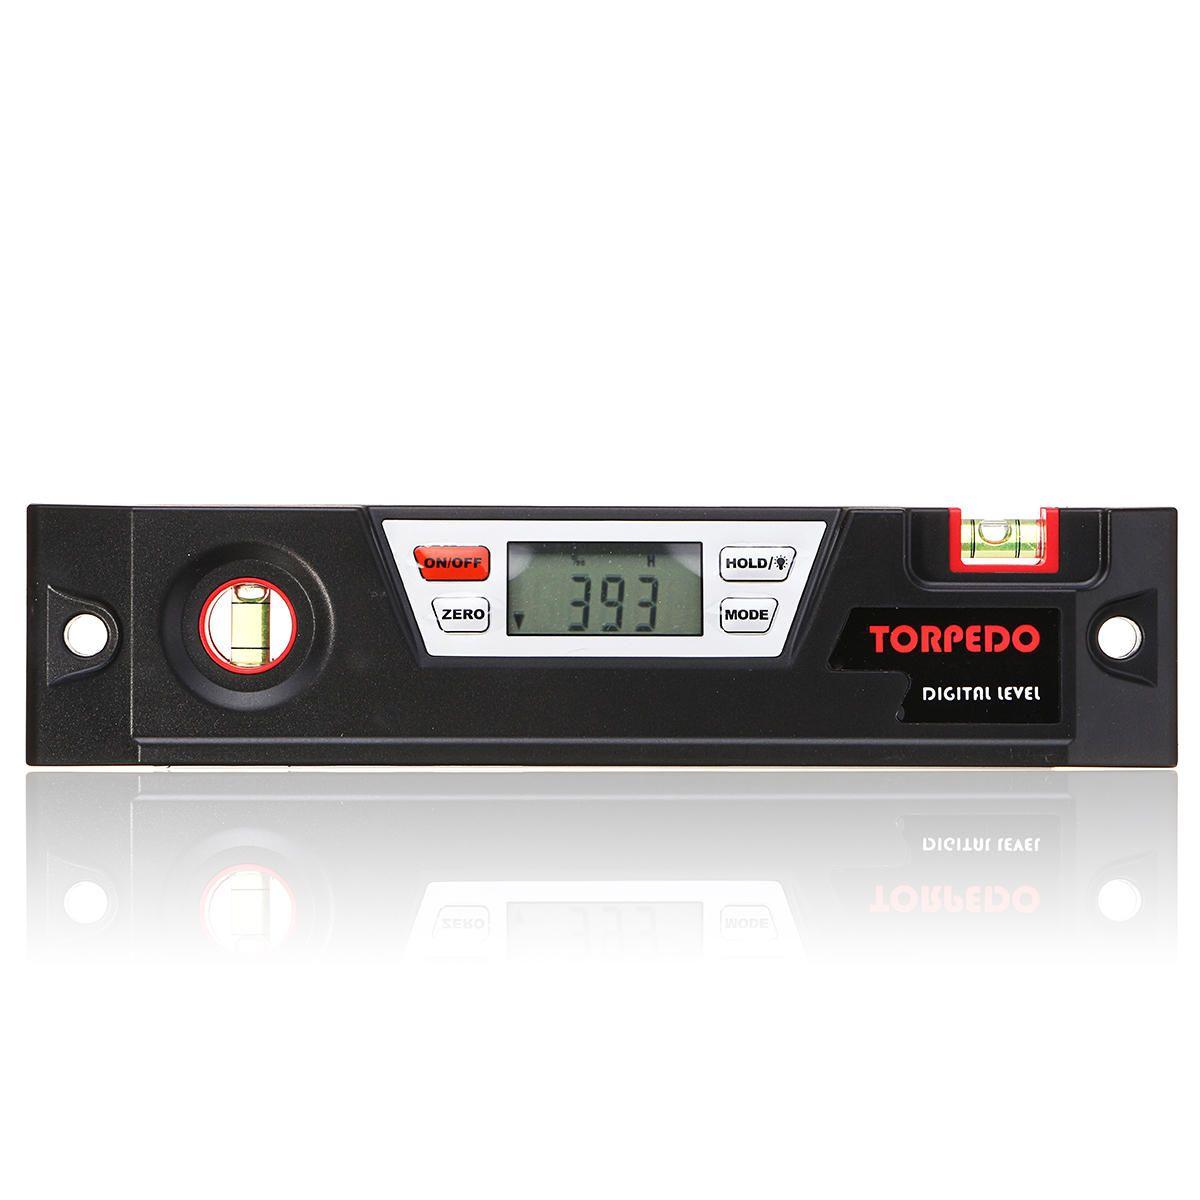 AHS US$32.01 Digital Angle Finder Gauge Bevel Box Protractor Inclinometer Spirit Level Tool